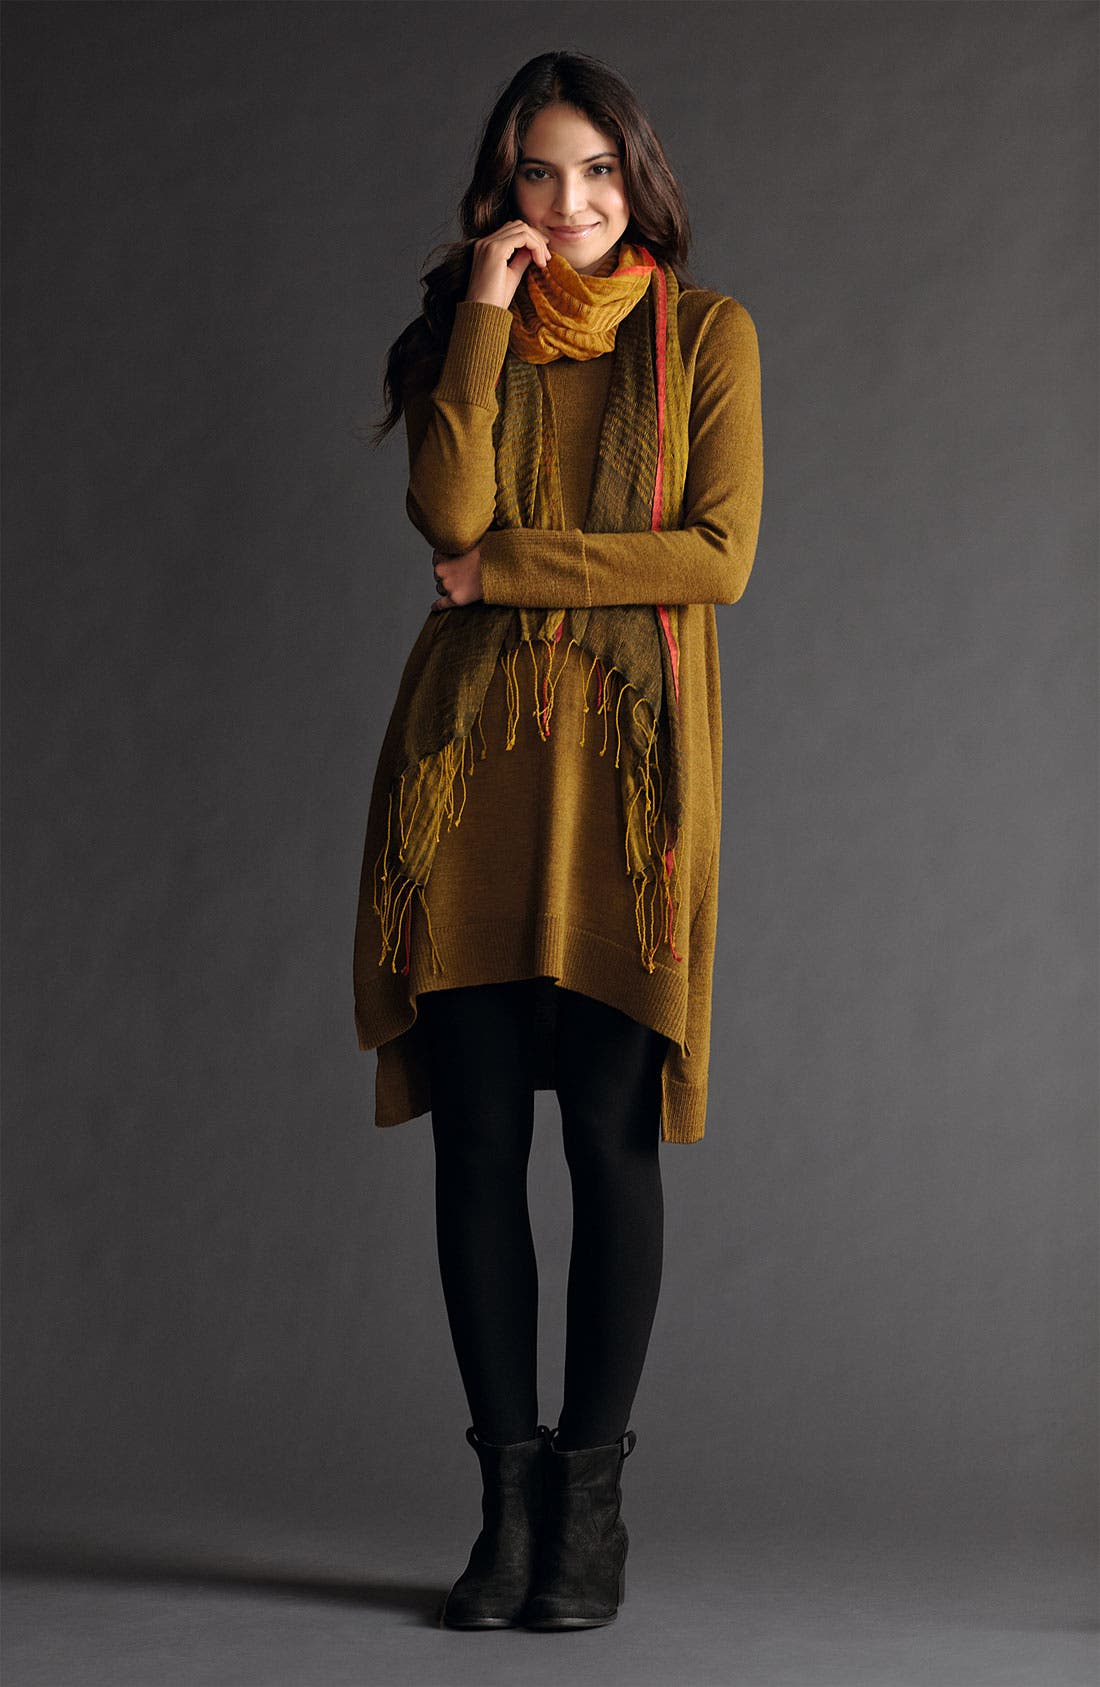 Main Image - Eileen Fisher Tunic Dress, Leggings & Scarf